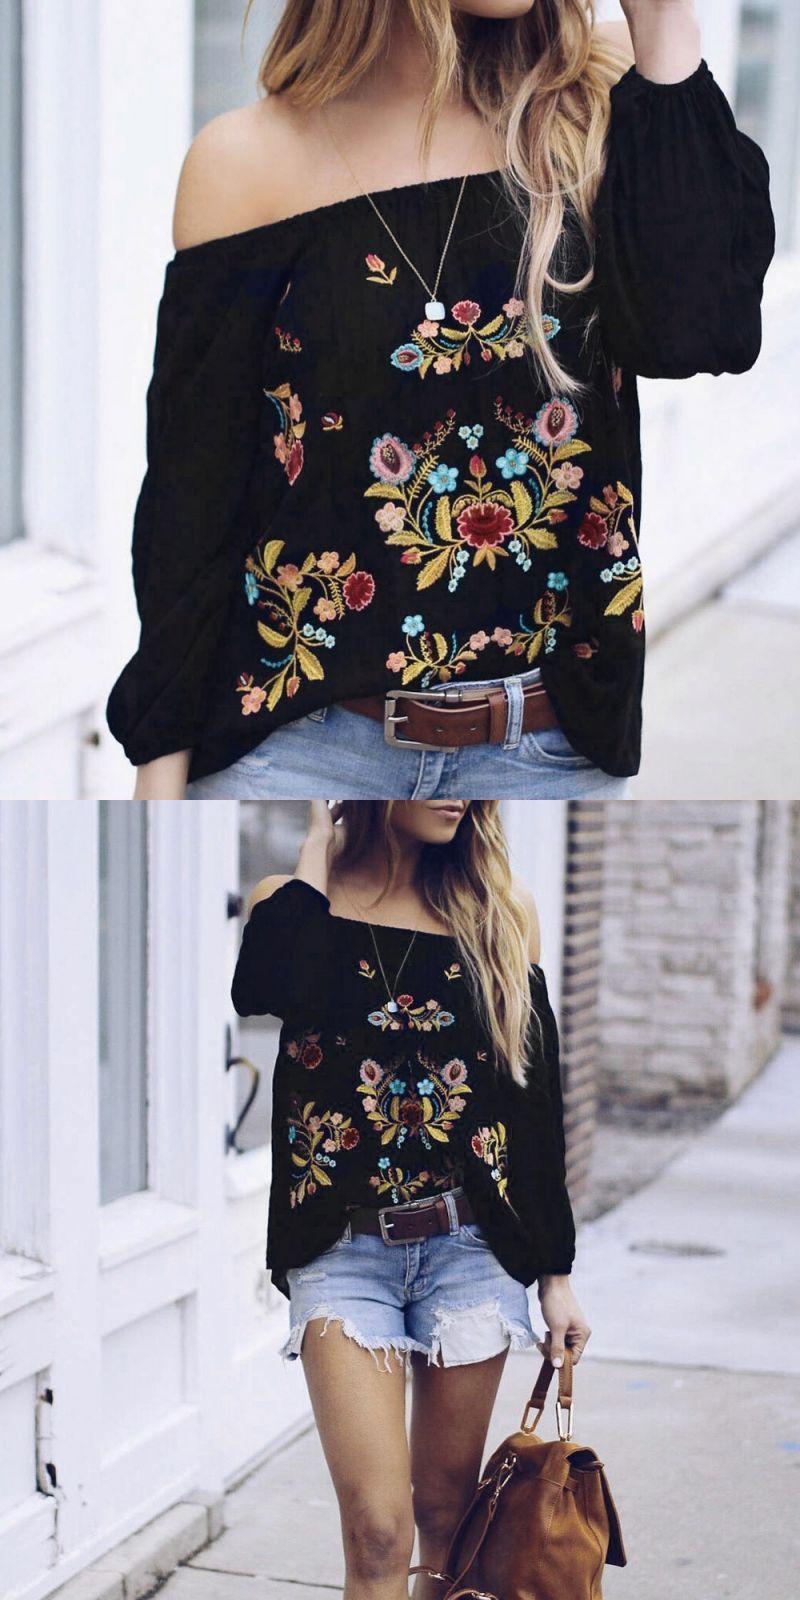 ffedcdaea0d3f Off shoulder floral embroider chiffon blouse black backless long sleeve  women blouses 2018 boho autumn blouse shirt  polyester  regular  casual   chiffon ...